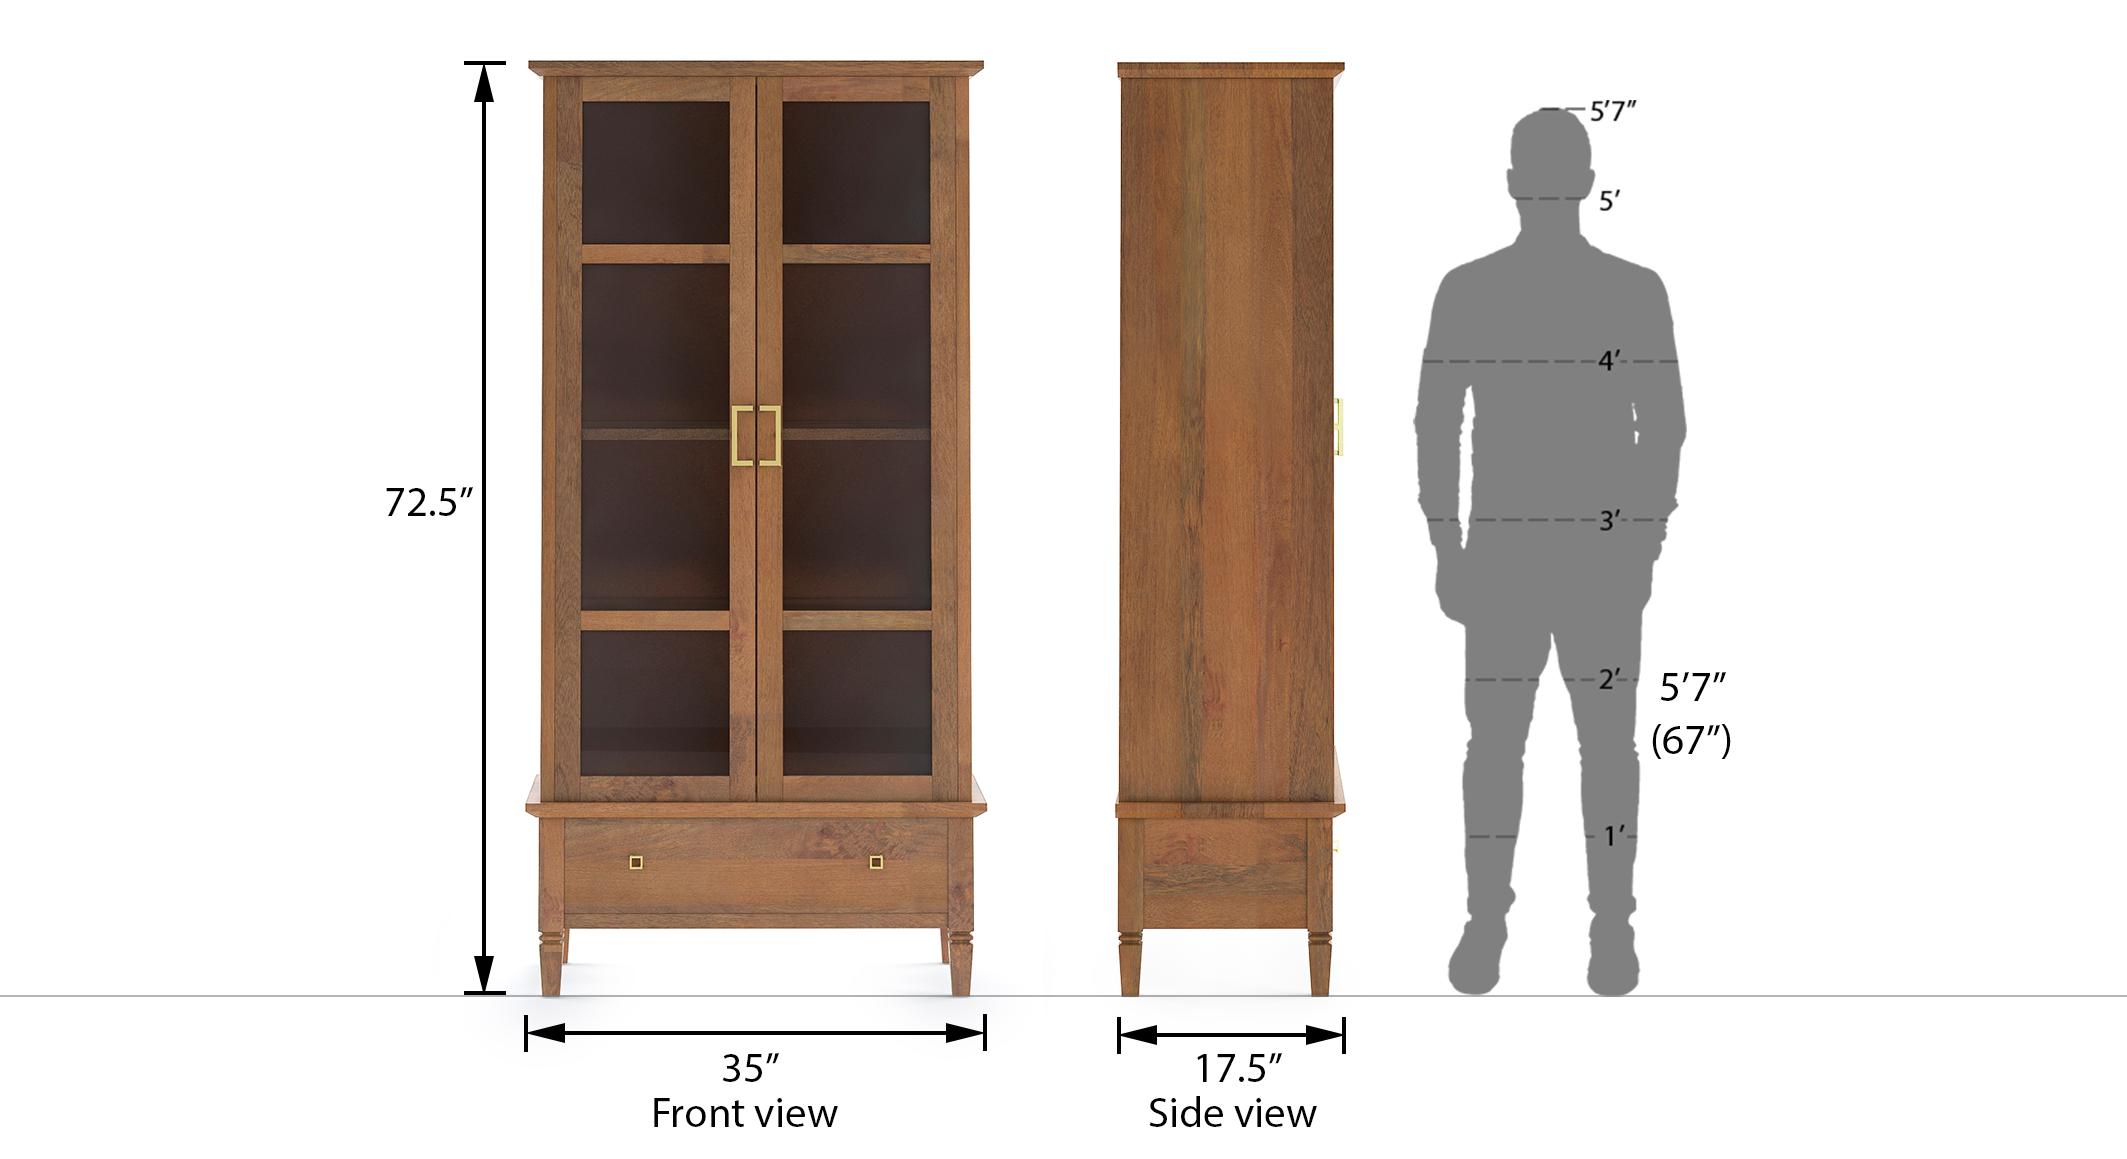 Malabar bookshelf display cabinet 55 book capacity amber walnut finish 6